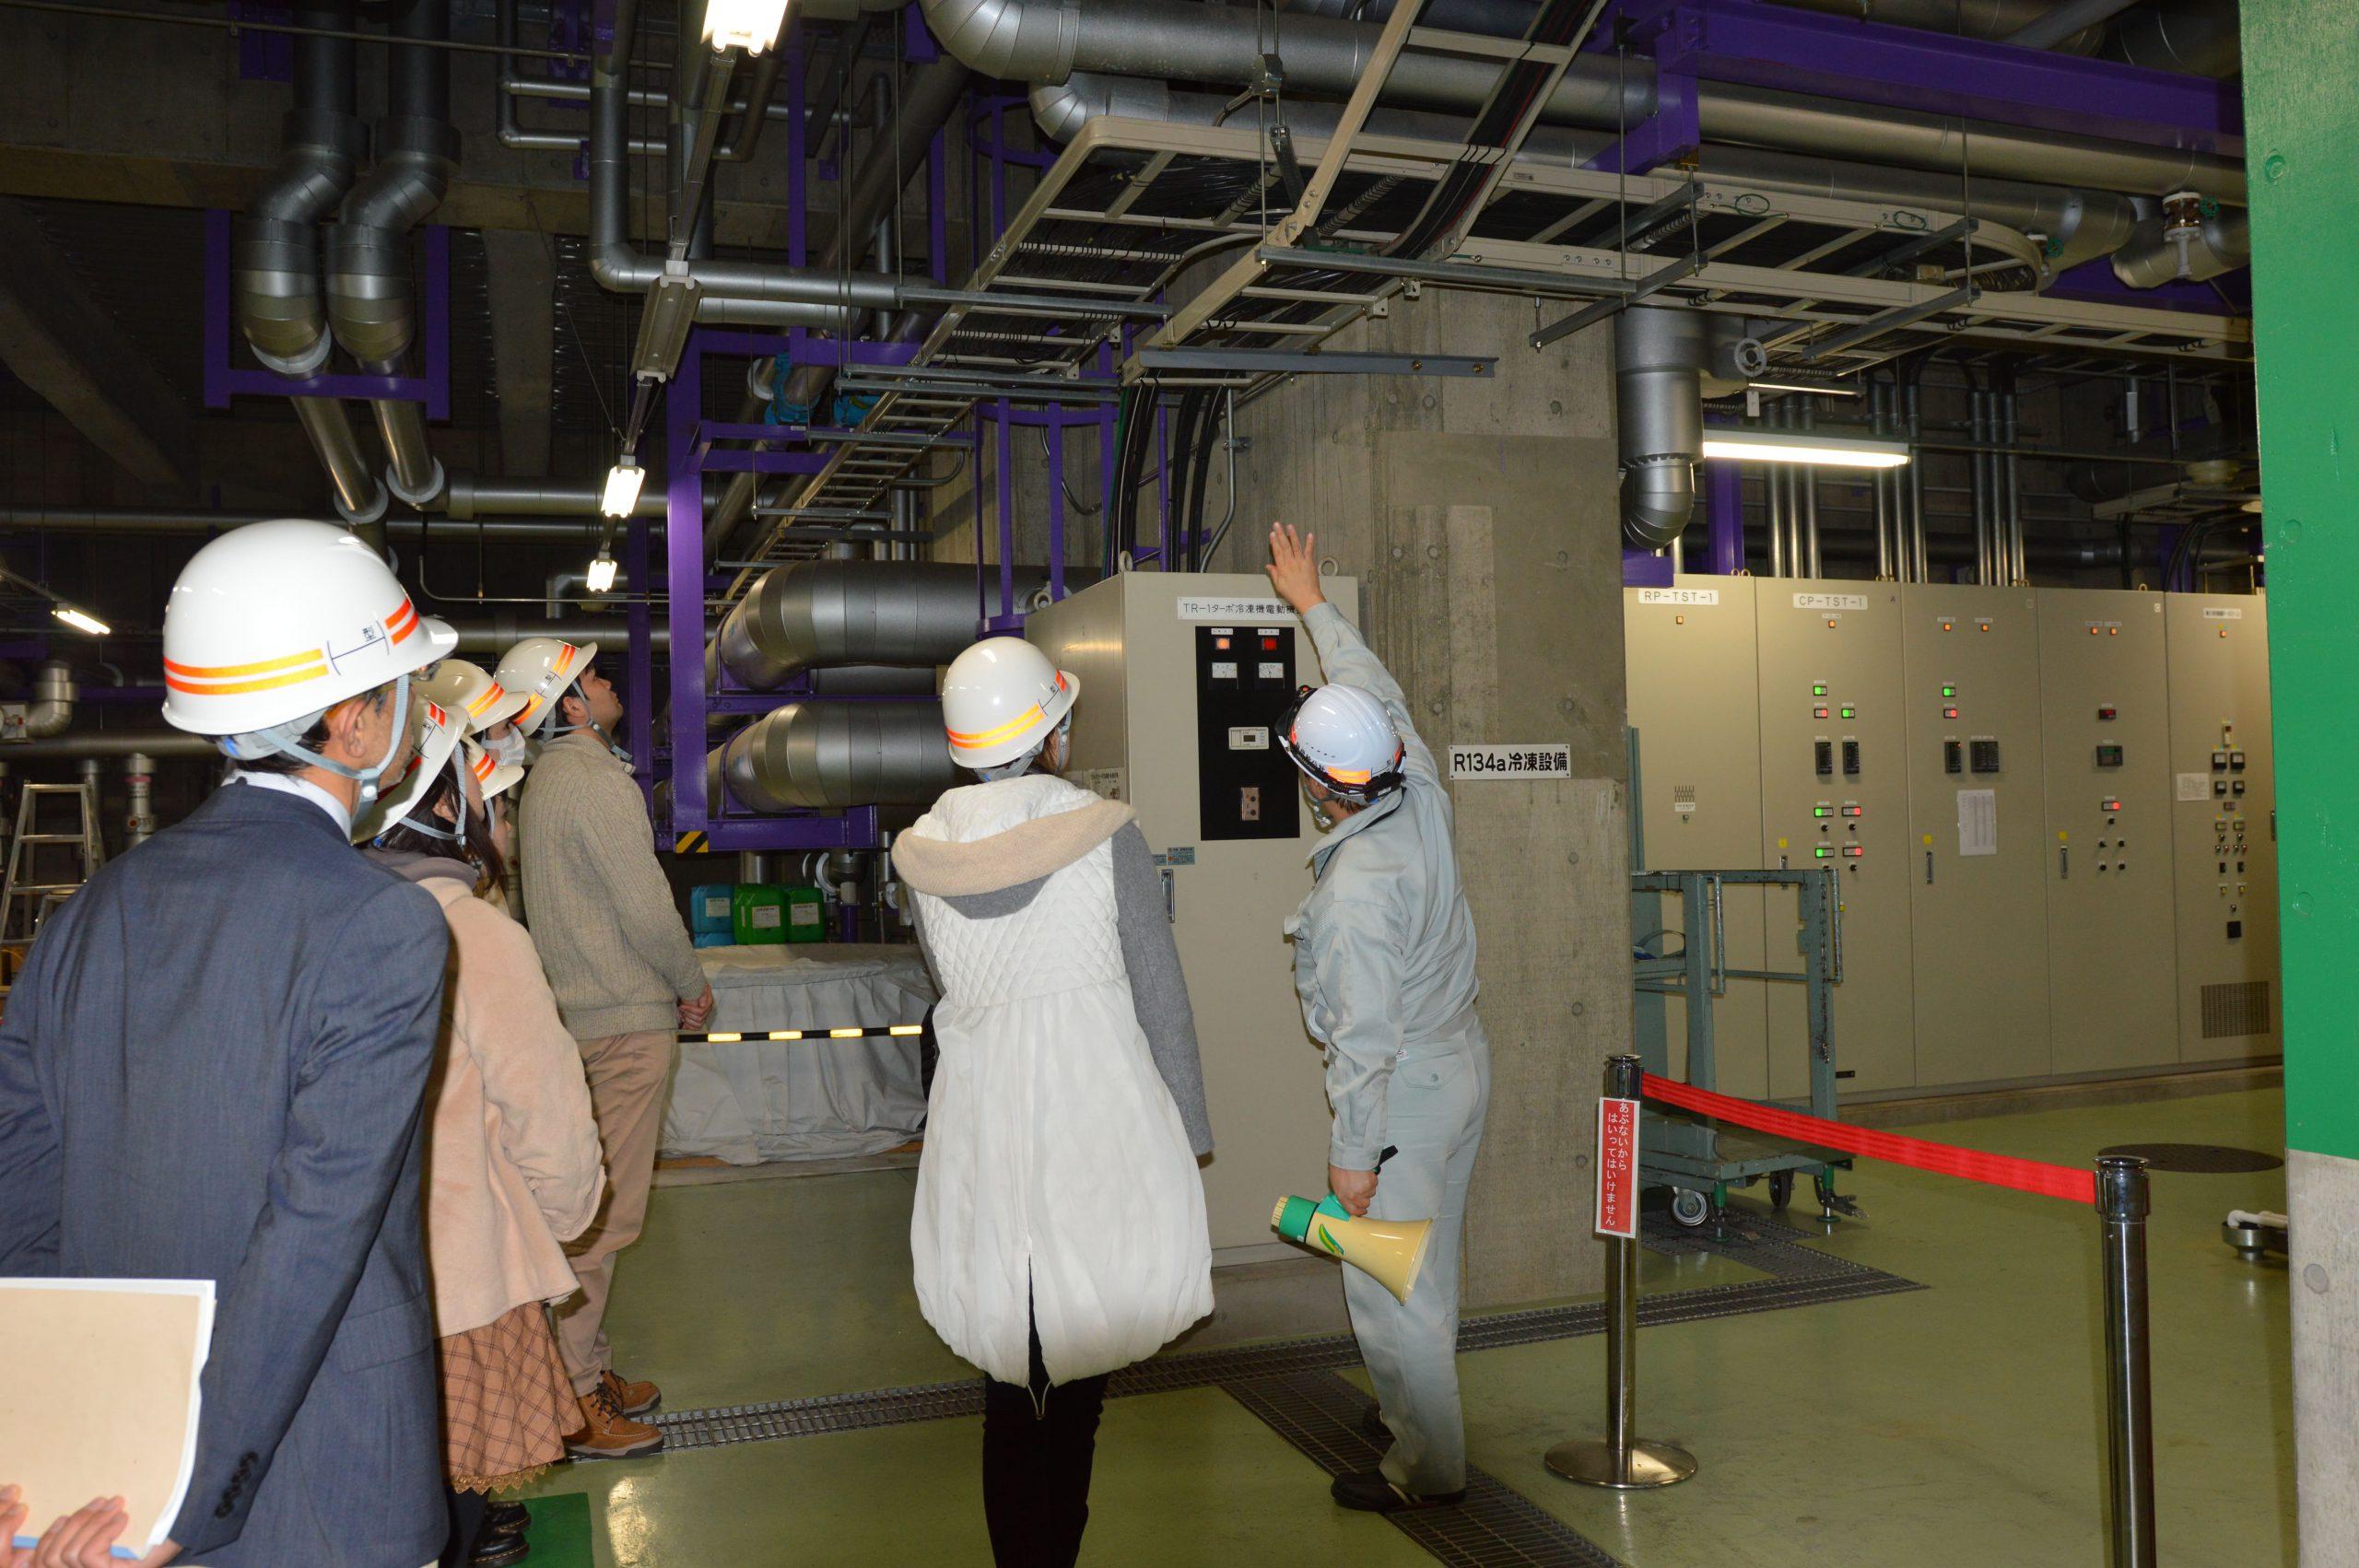 訪問先 :札幌駅地域熱供給プラント<br /> 関連科目:環境政策事例研究<br />      Environmental Policy